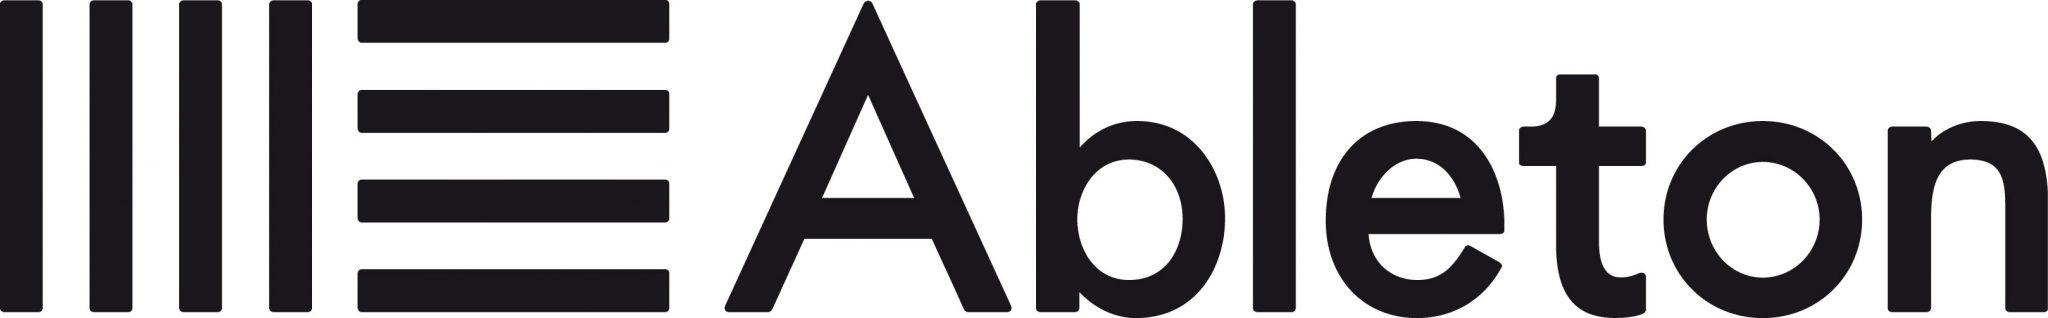 Ableton_logo_black